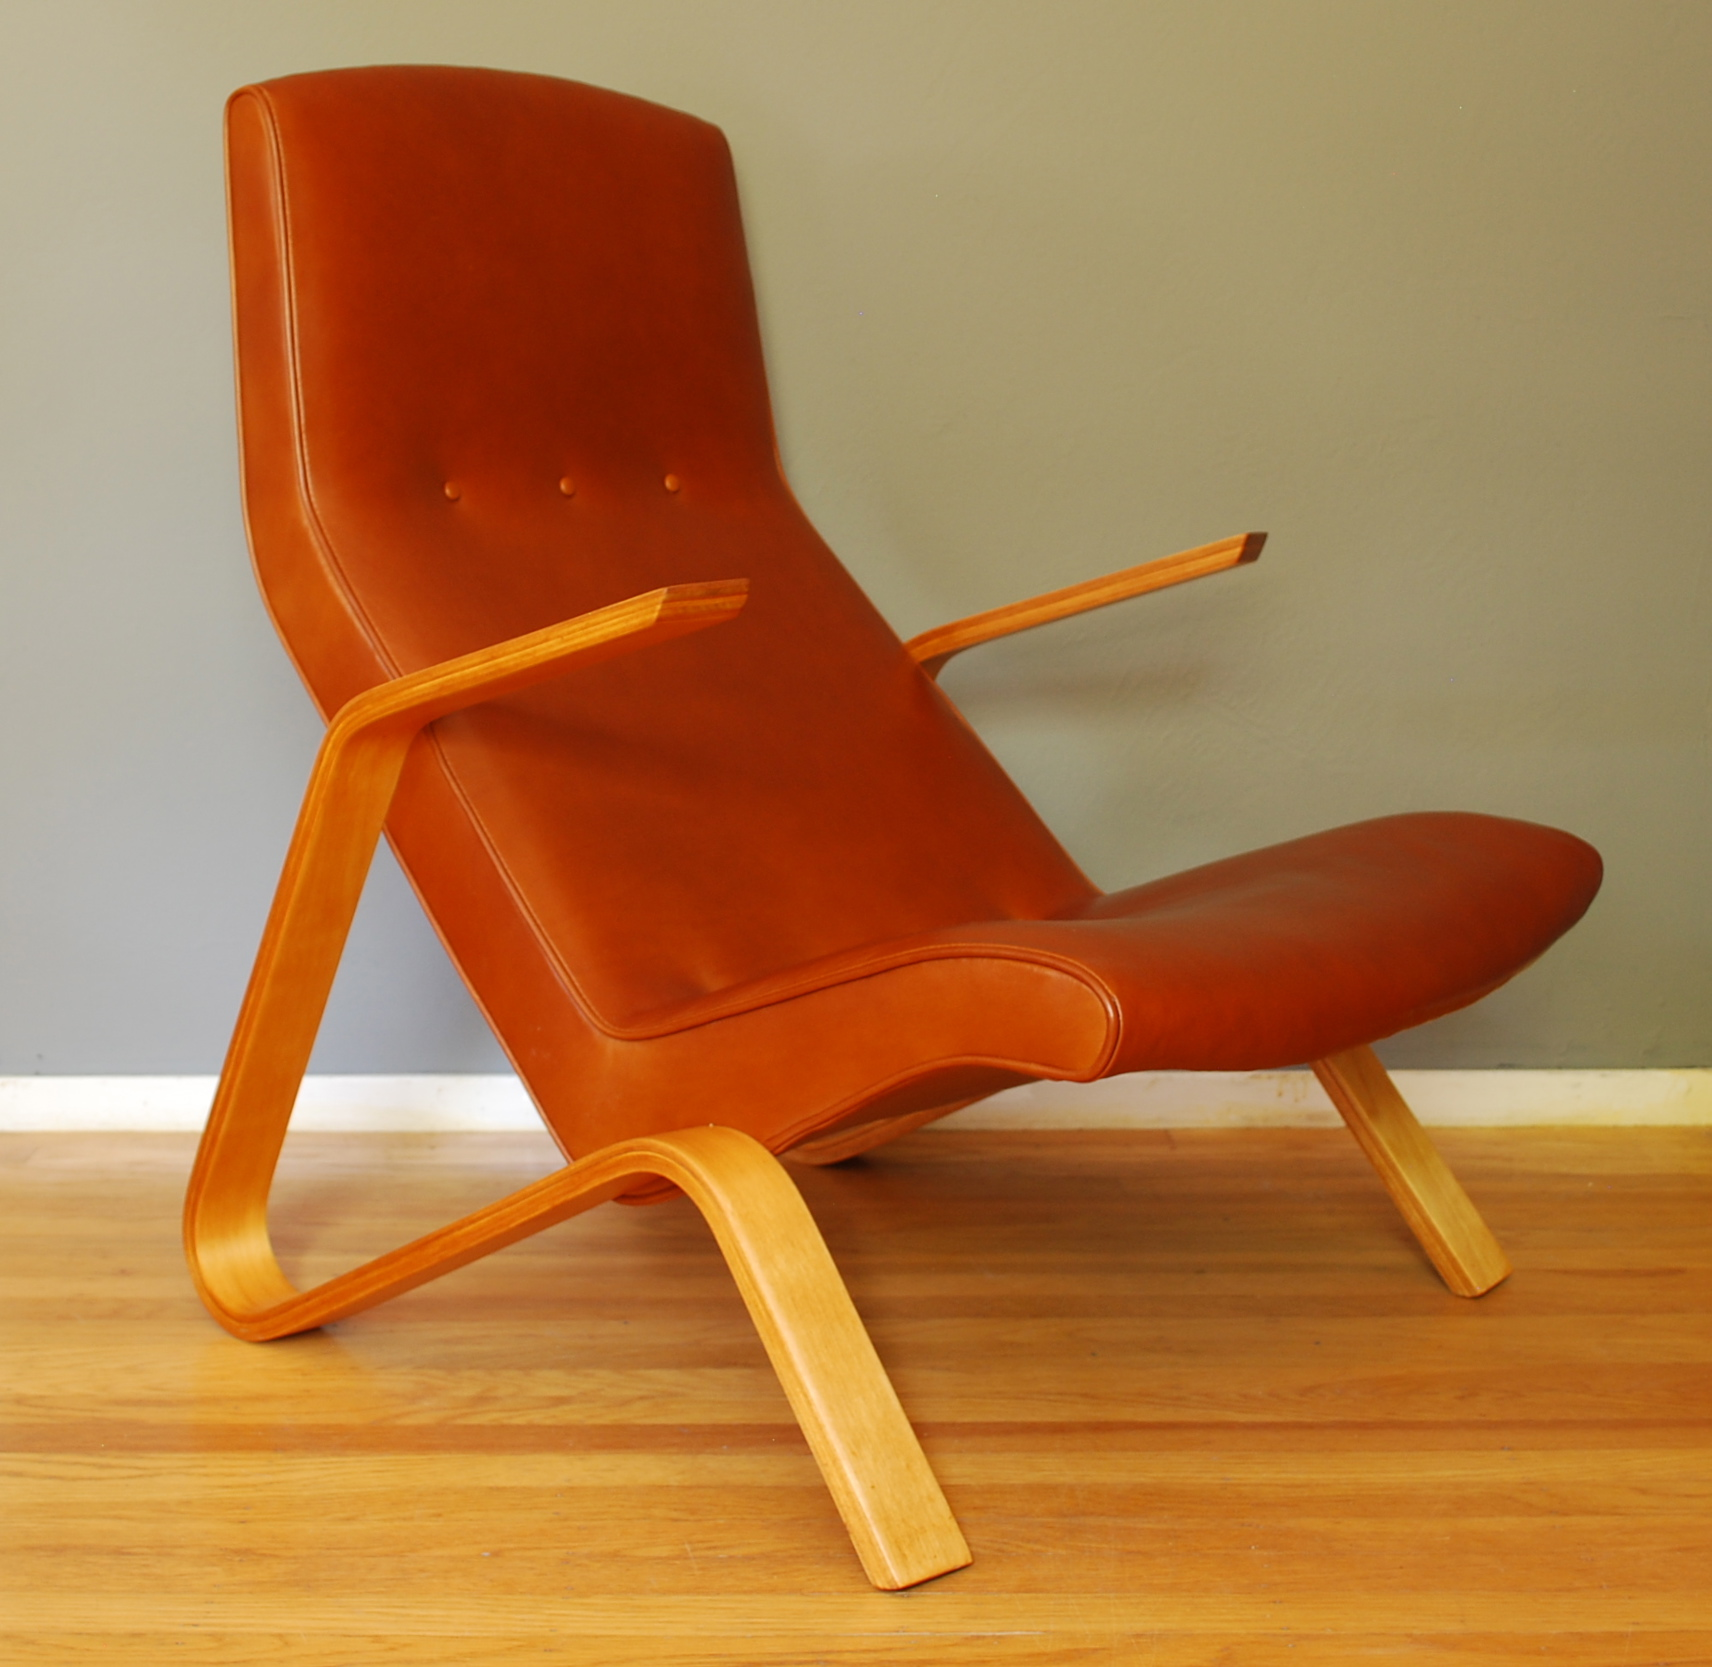 Craigslist Dc Apartments: Eames Lounge Chair Craigslist